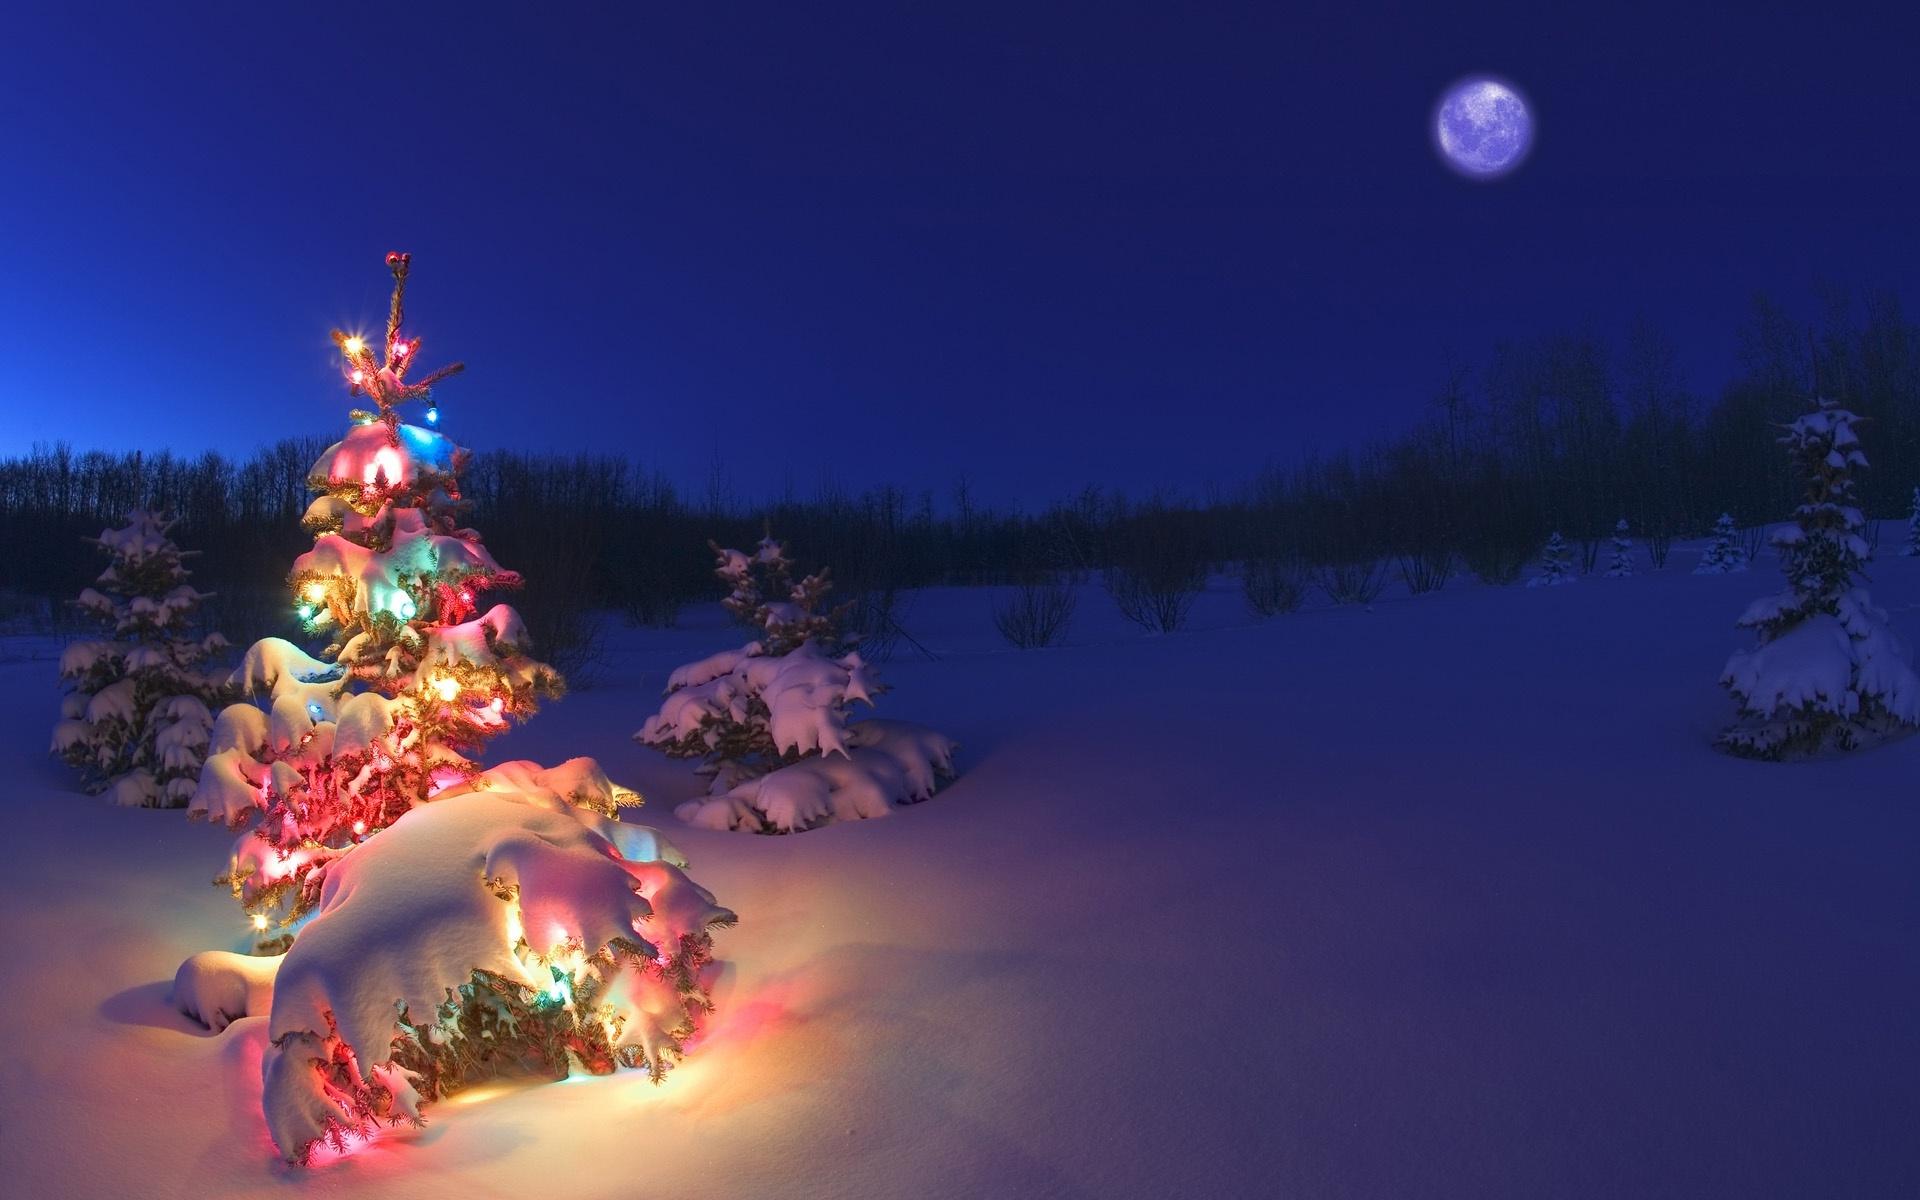 Weihnachtsbilder New York.Christmas Tree Snow Wallpaper Sf Wallpaper